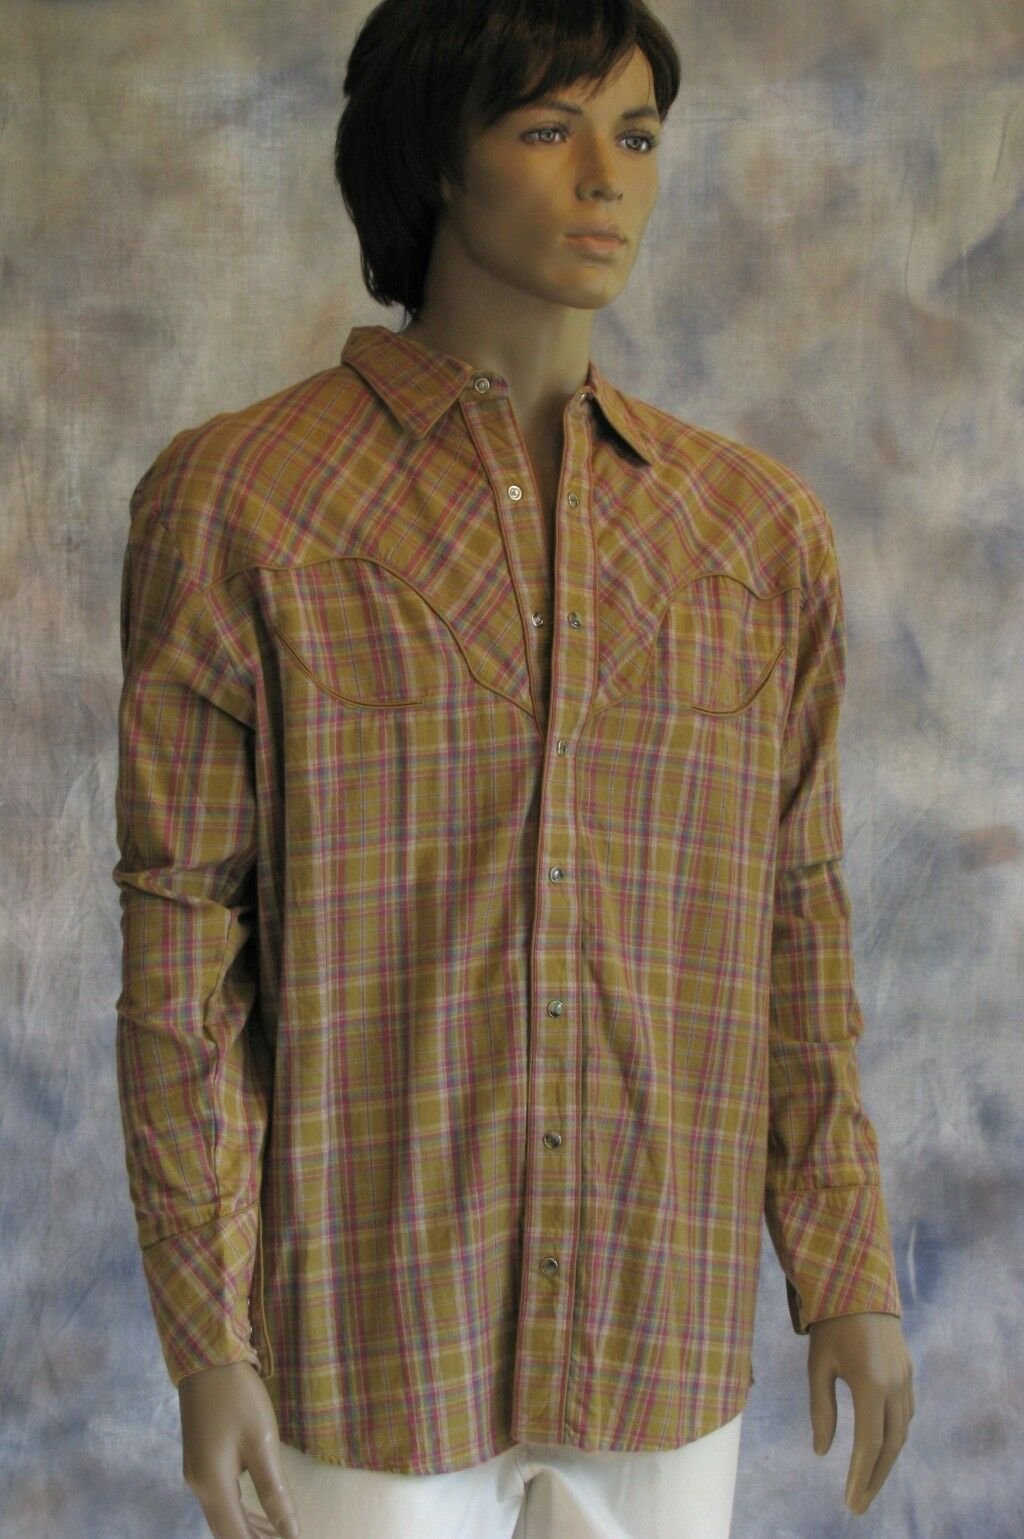 NWOT SCULLY Western Cowboy Show Plaid Shirt Sz L Mustard Pink Purple 100% Cotton